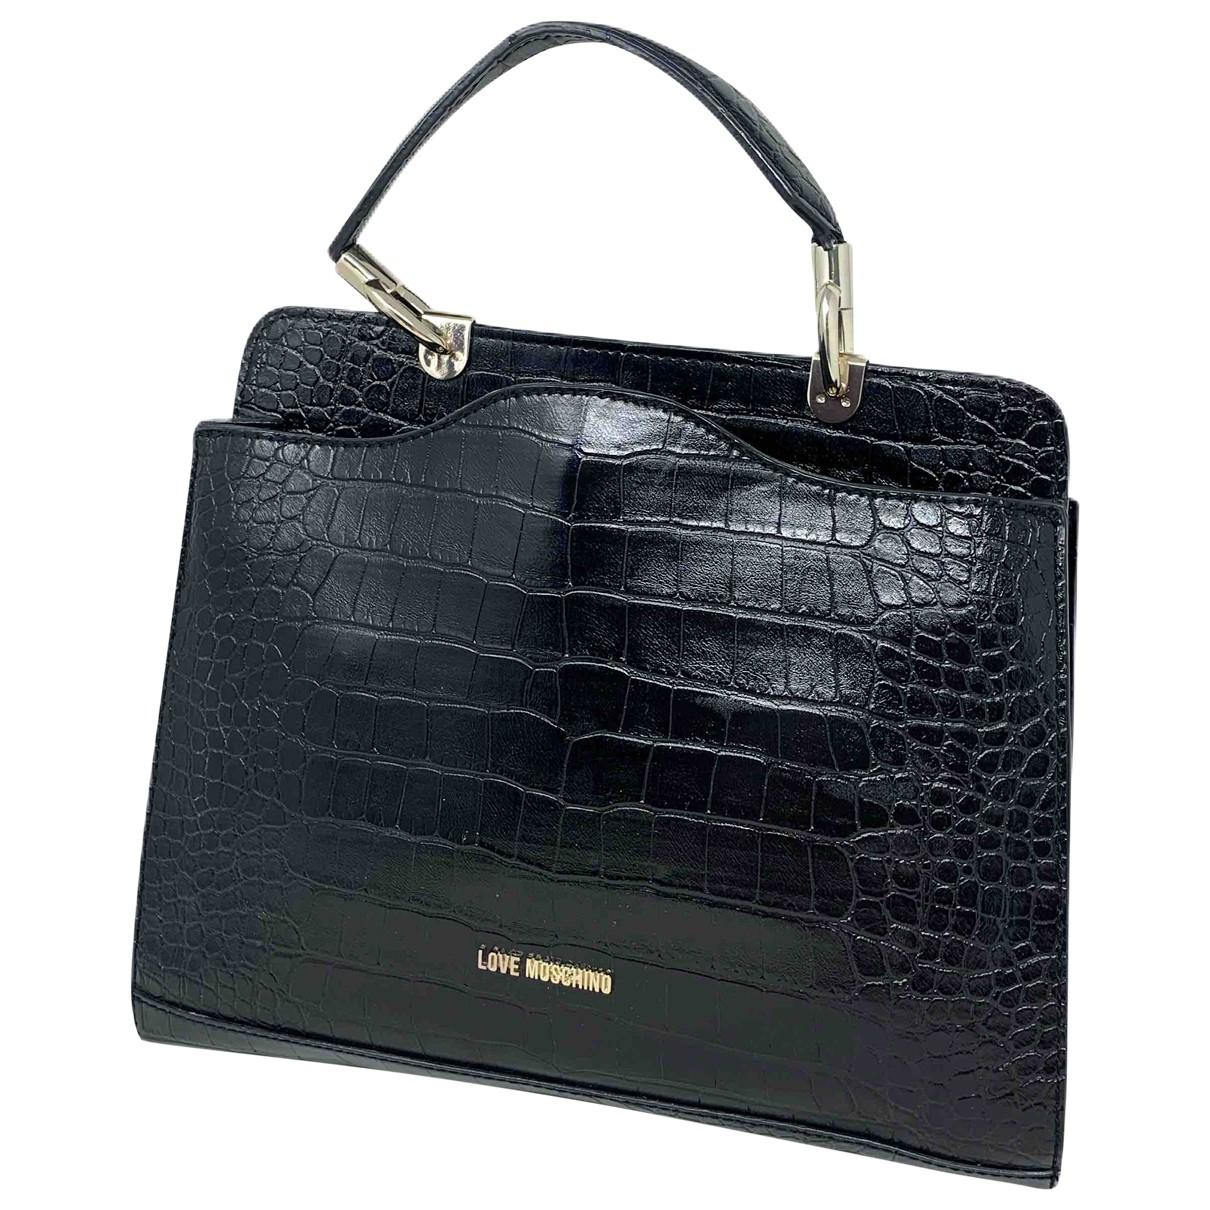 Moschino Love \N Black Leather handbag for Women \N